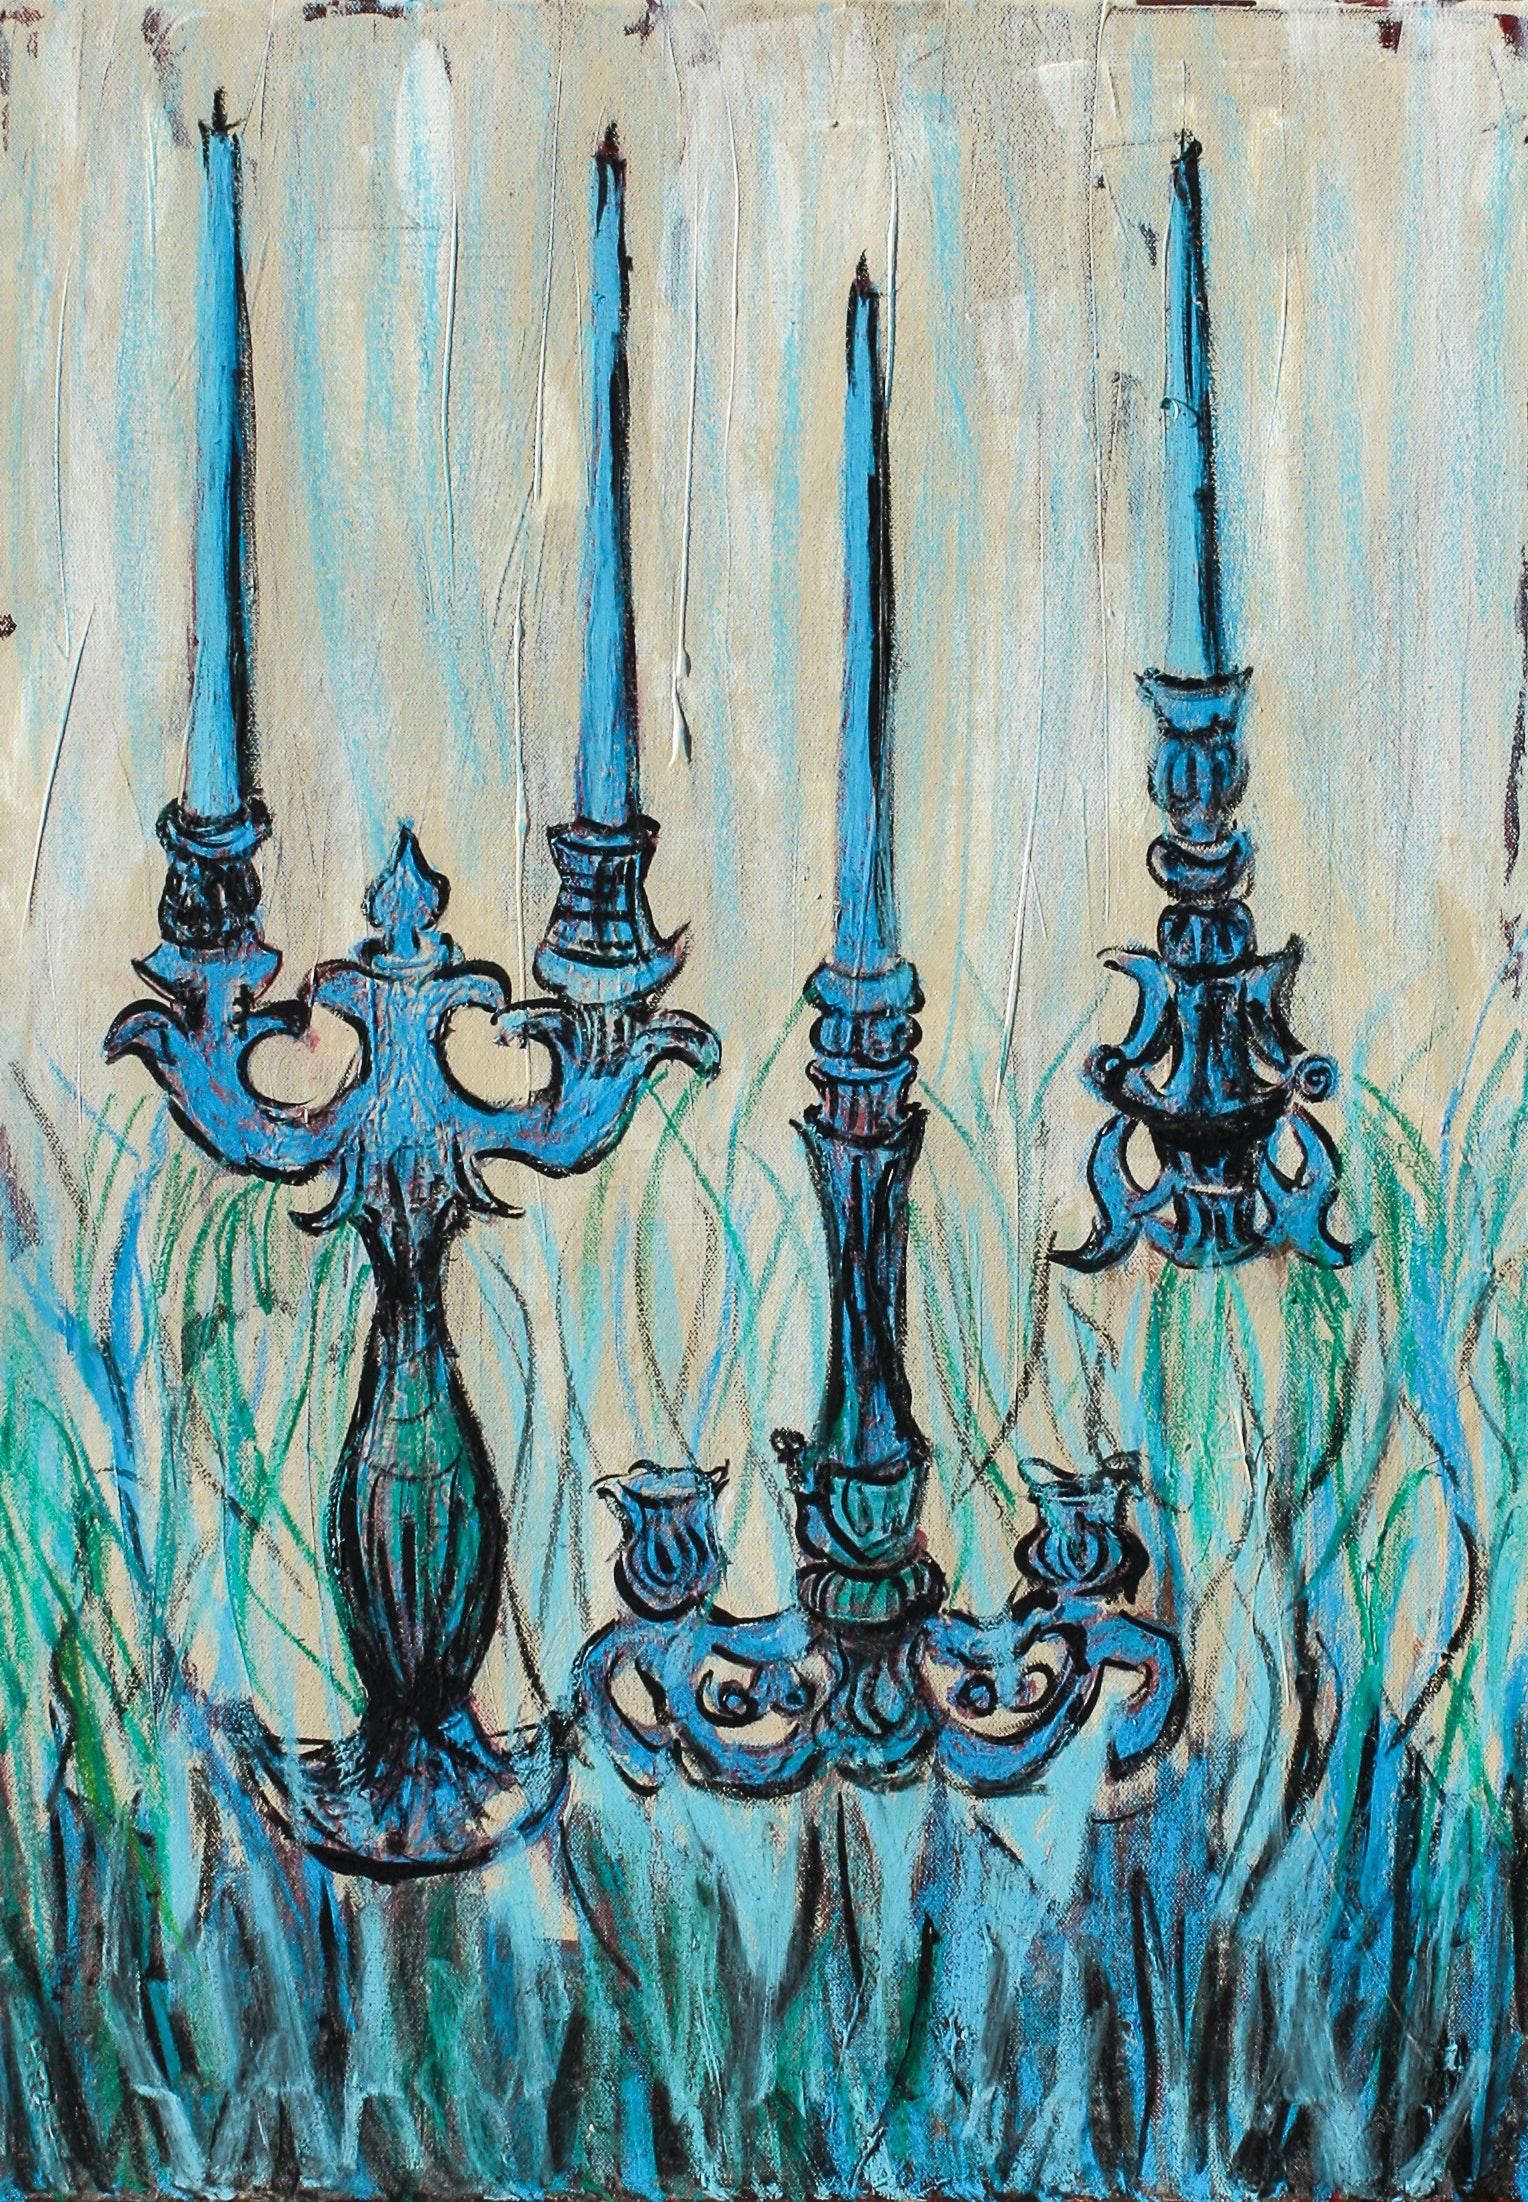 Blue candleholder